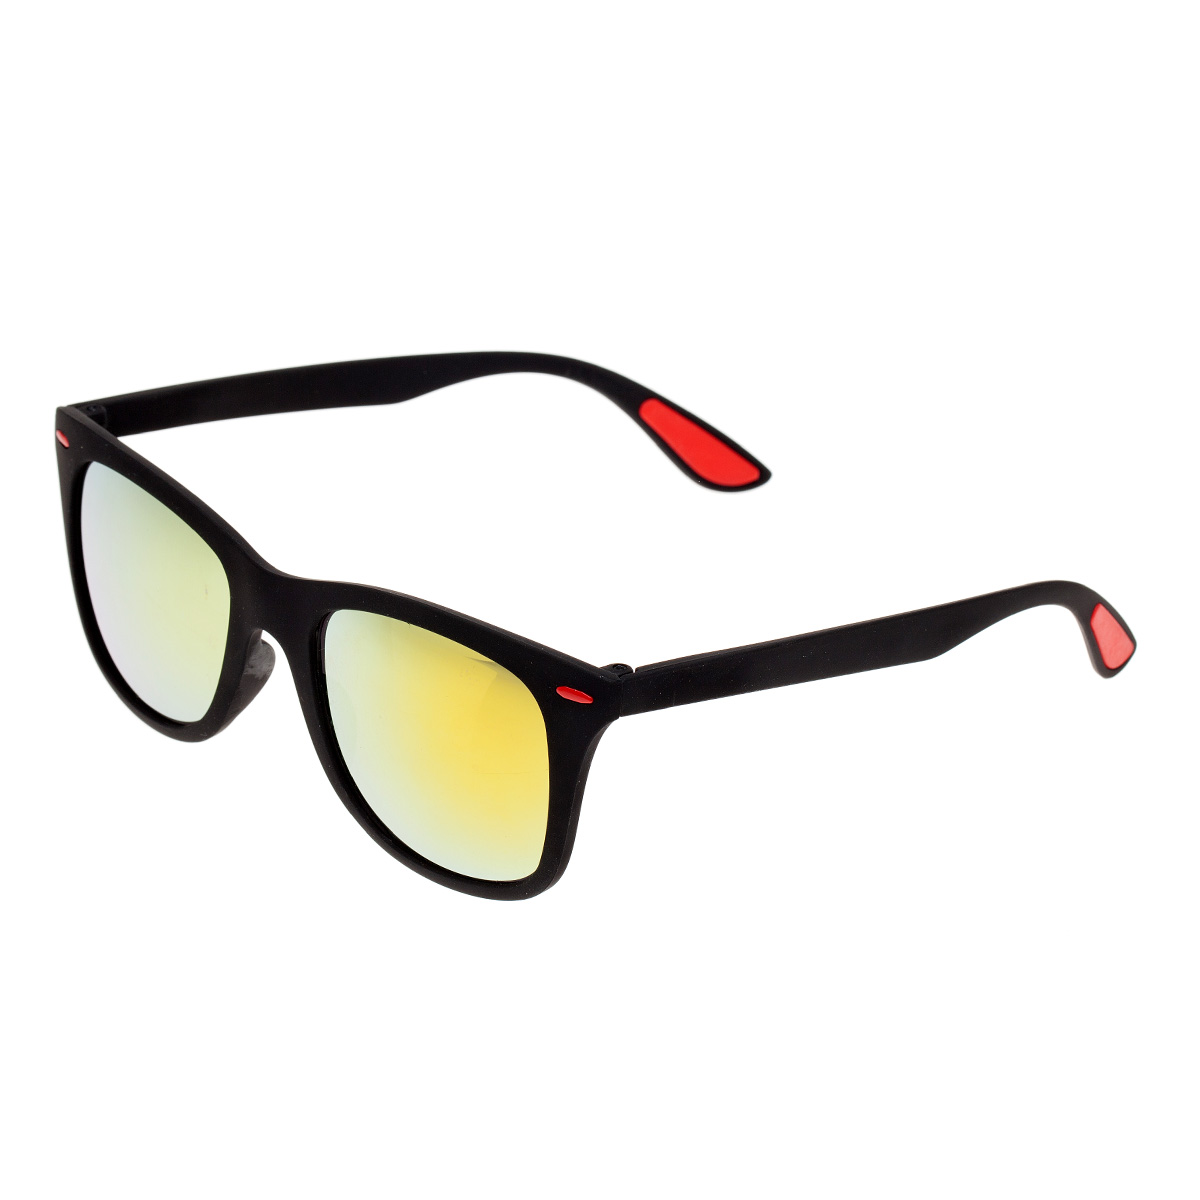 Фото - Очки солнцезащитные Sevenext, 23032-52 очки солнцезащитные sevenext 23032 28